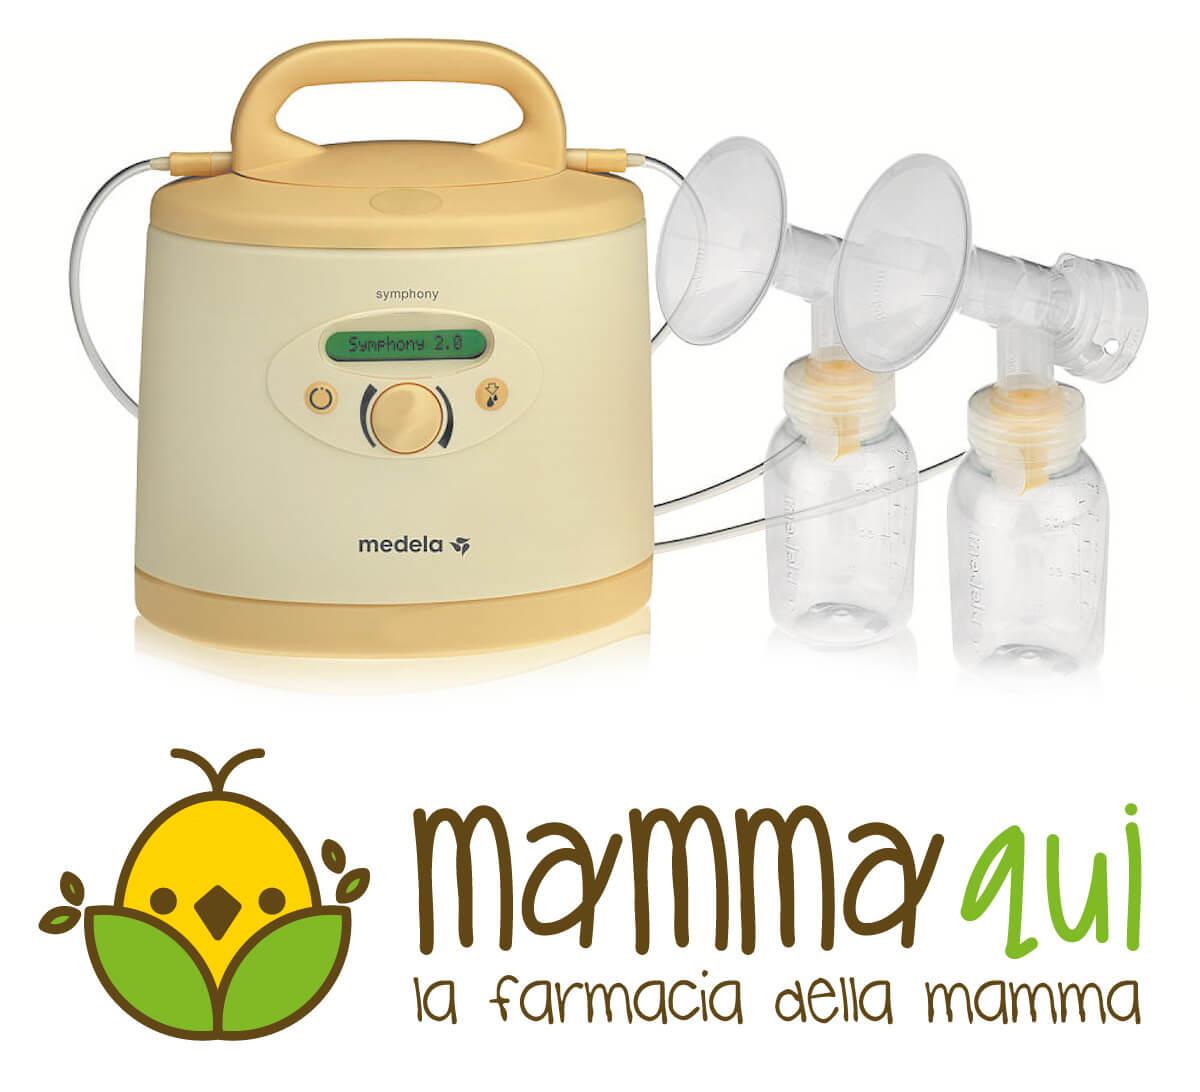 medela-mammaqui-andria